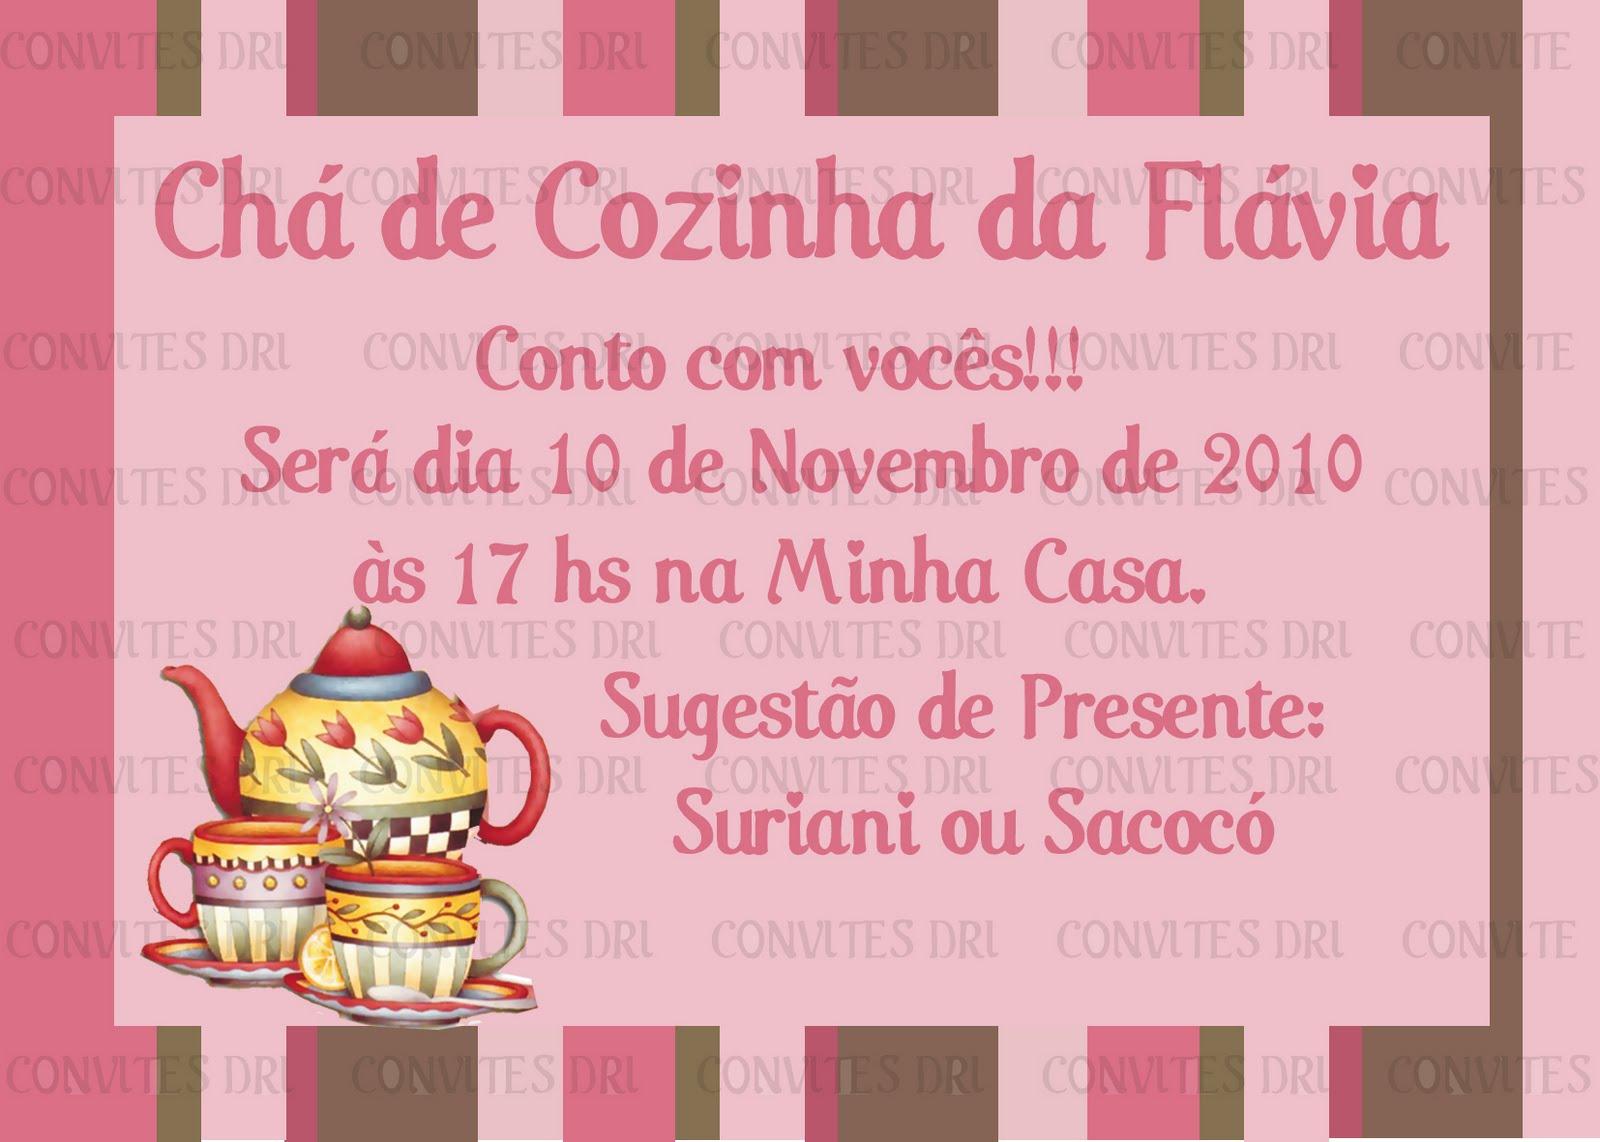 Modelos Convite Cha Cozinha HD Walls Find Wallpapers #AA8522 1600 1142